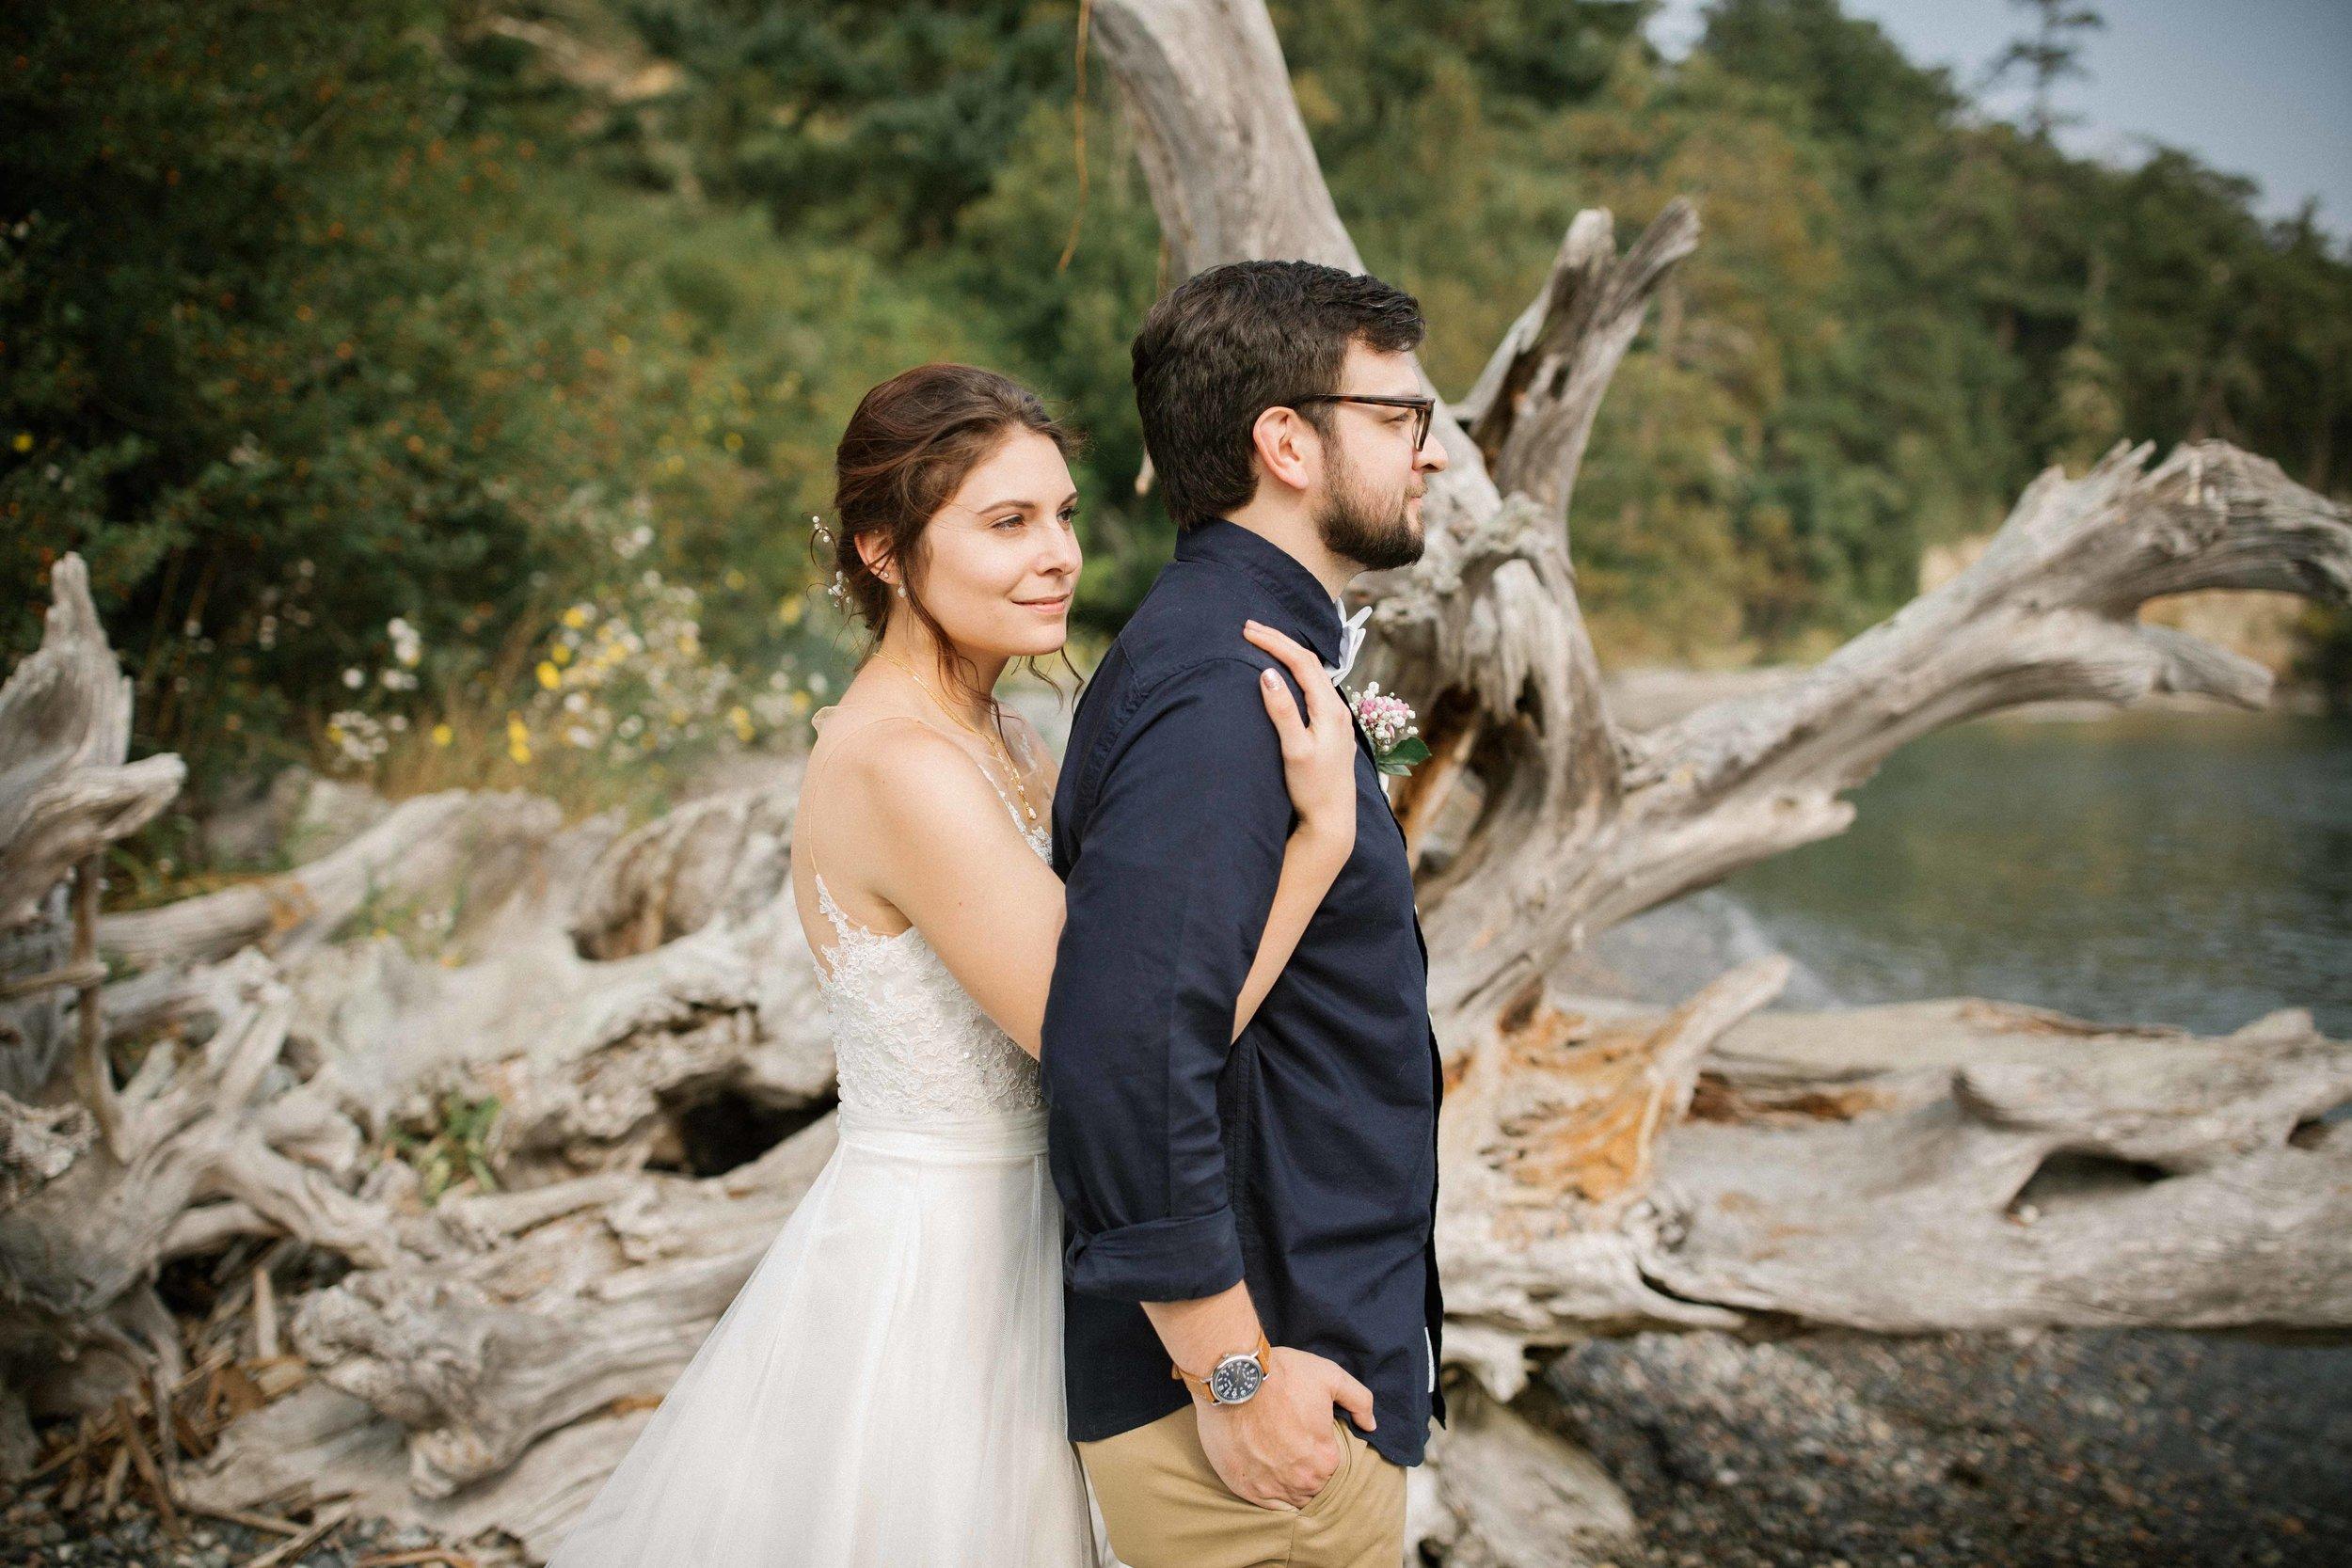 deception-pass-wedding-54.jpg